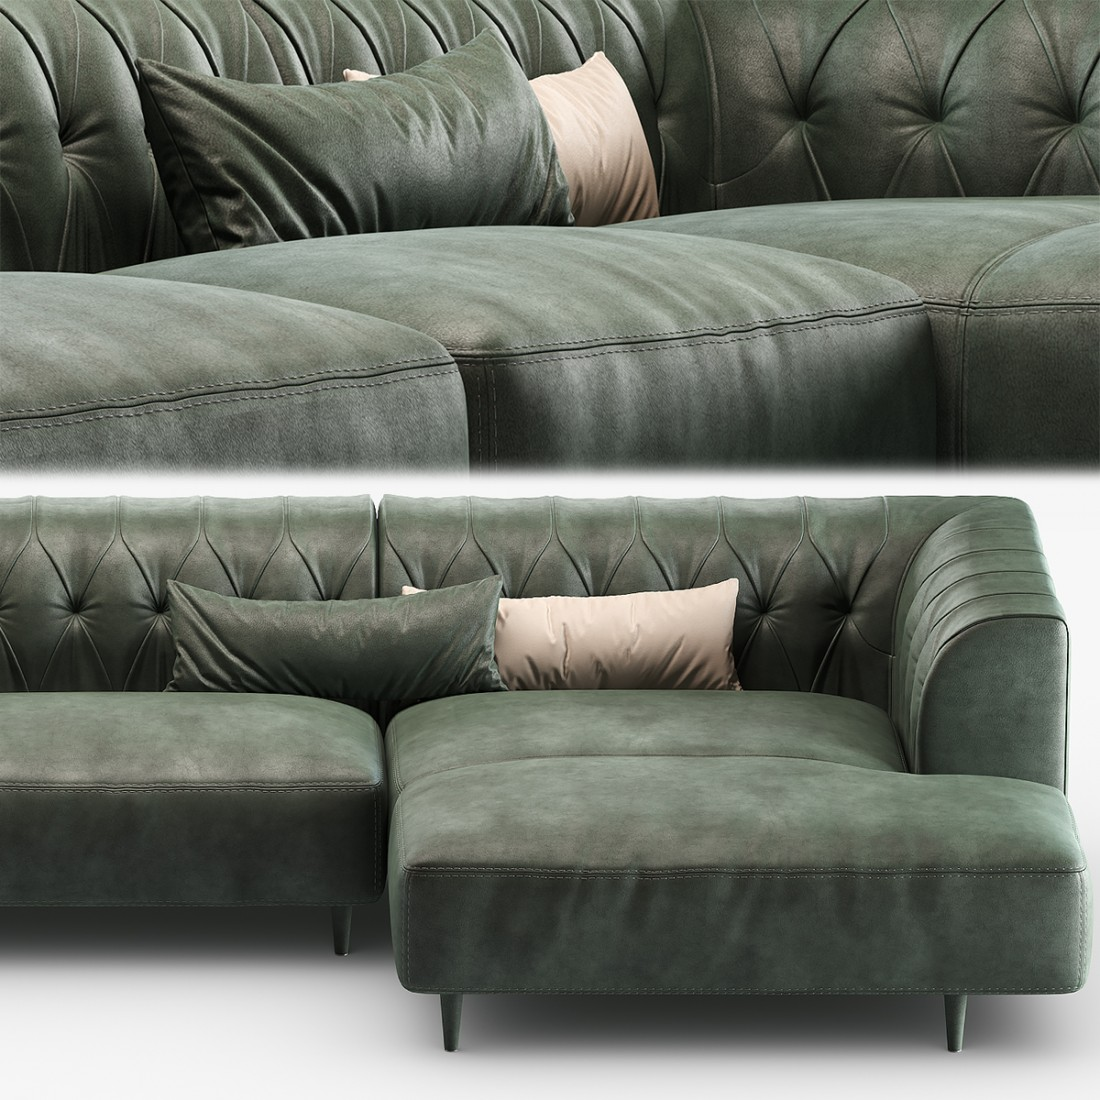 Sofa gamma arredamenti marlon s03 d31 pg010 3d model for Dama arredamenti